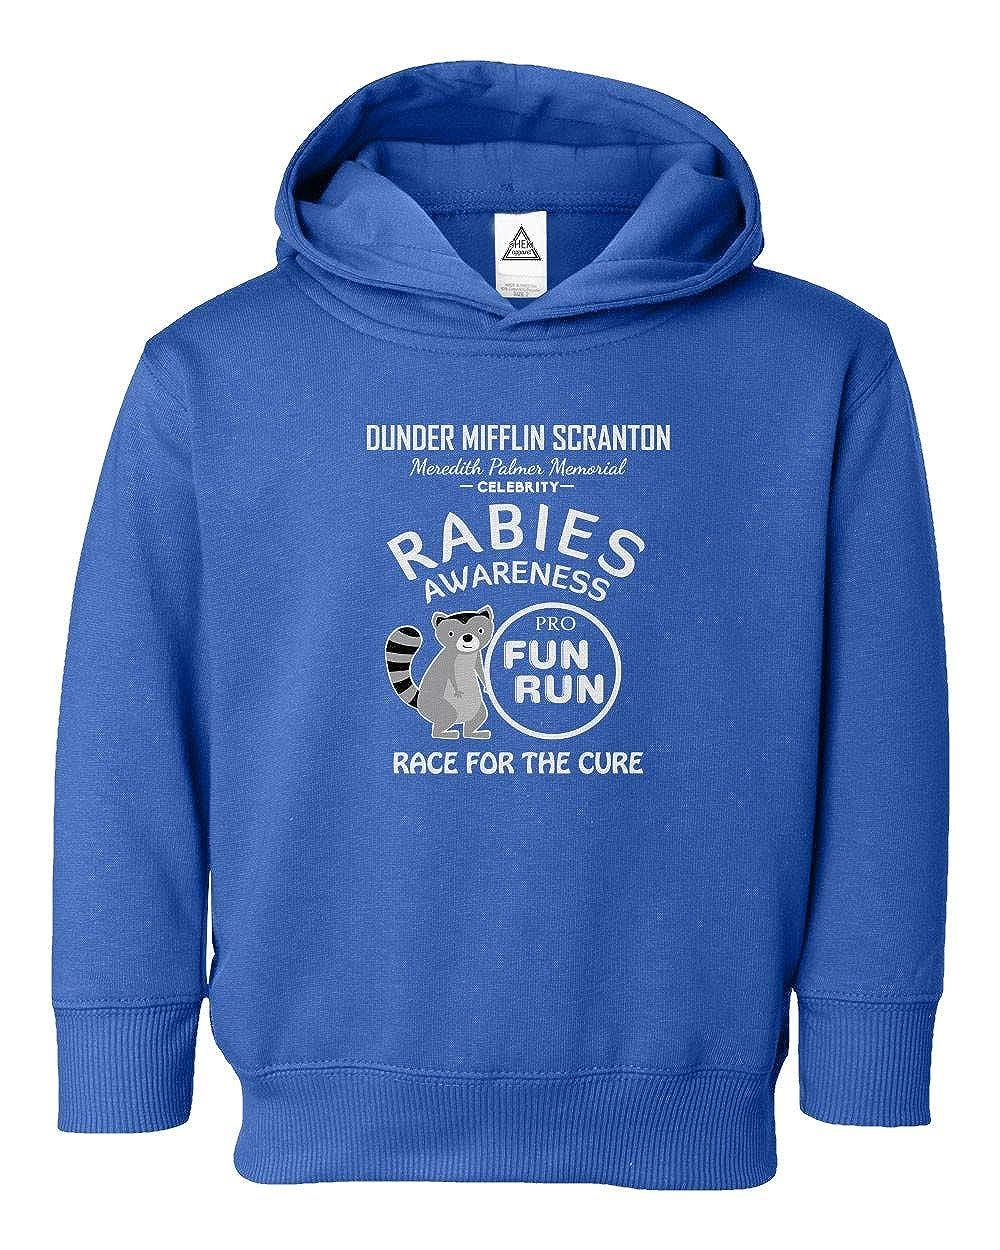 Rabies Awareness Dunder Mifflin Fun Run Little Kids Hoodie Toddler Sweatshirt